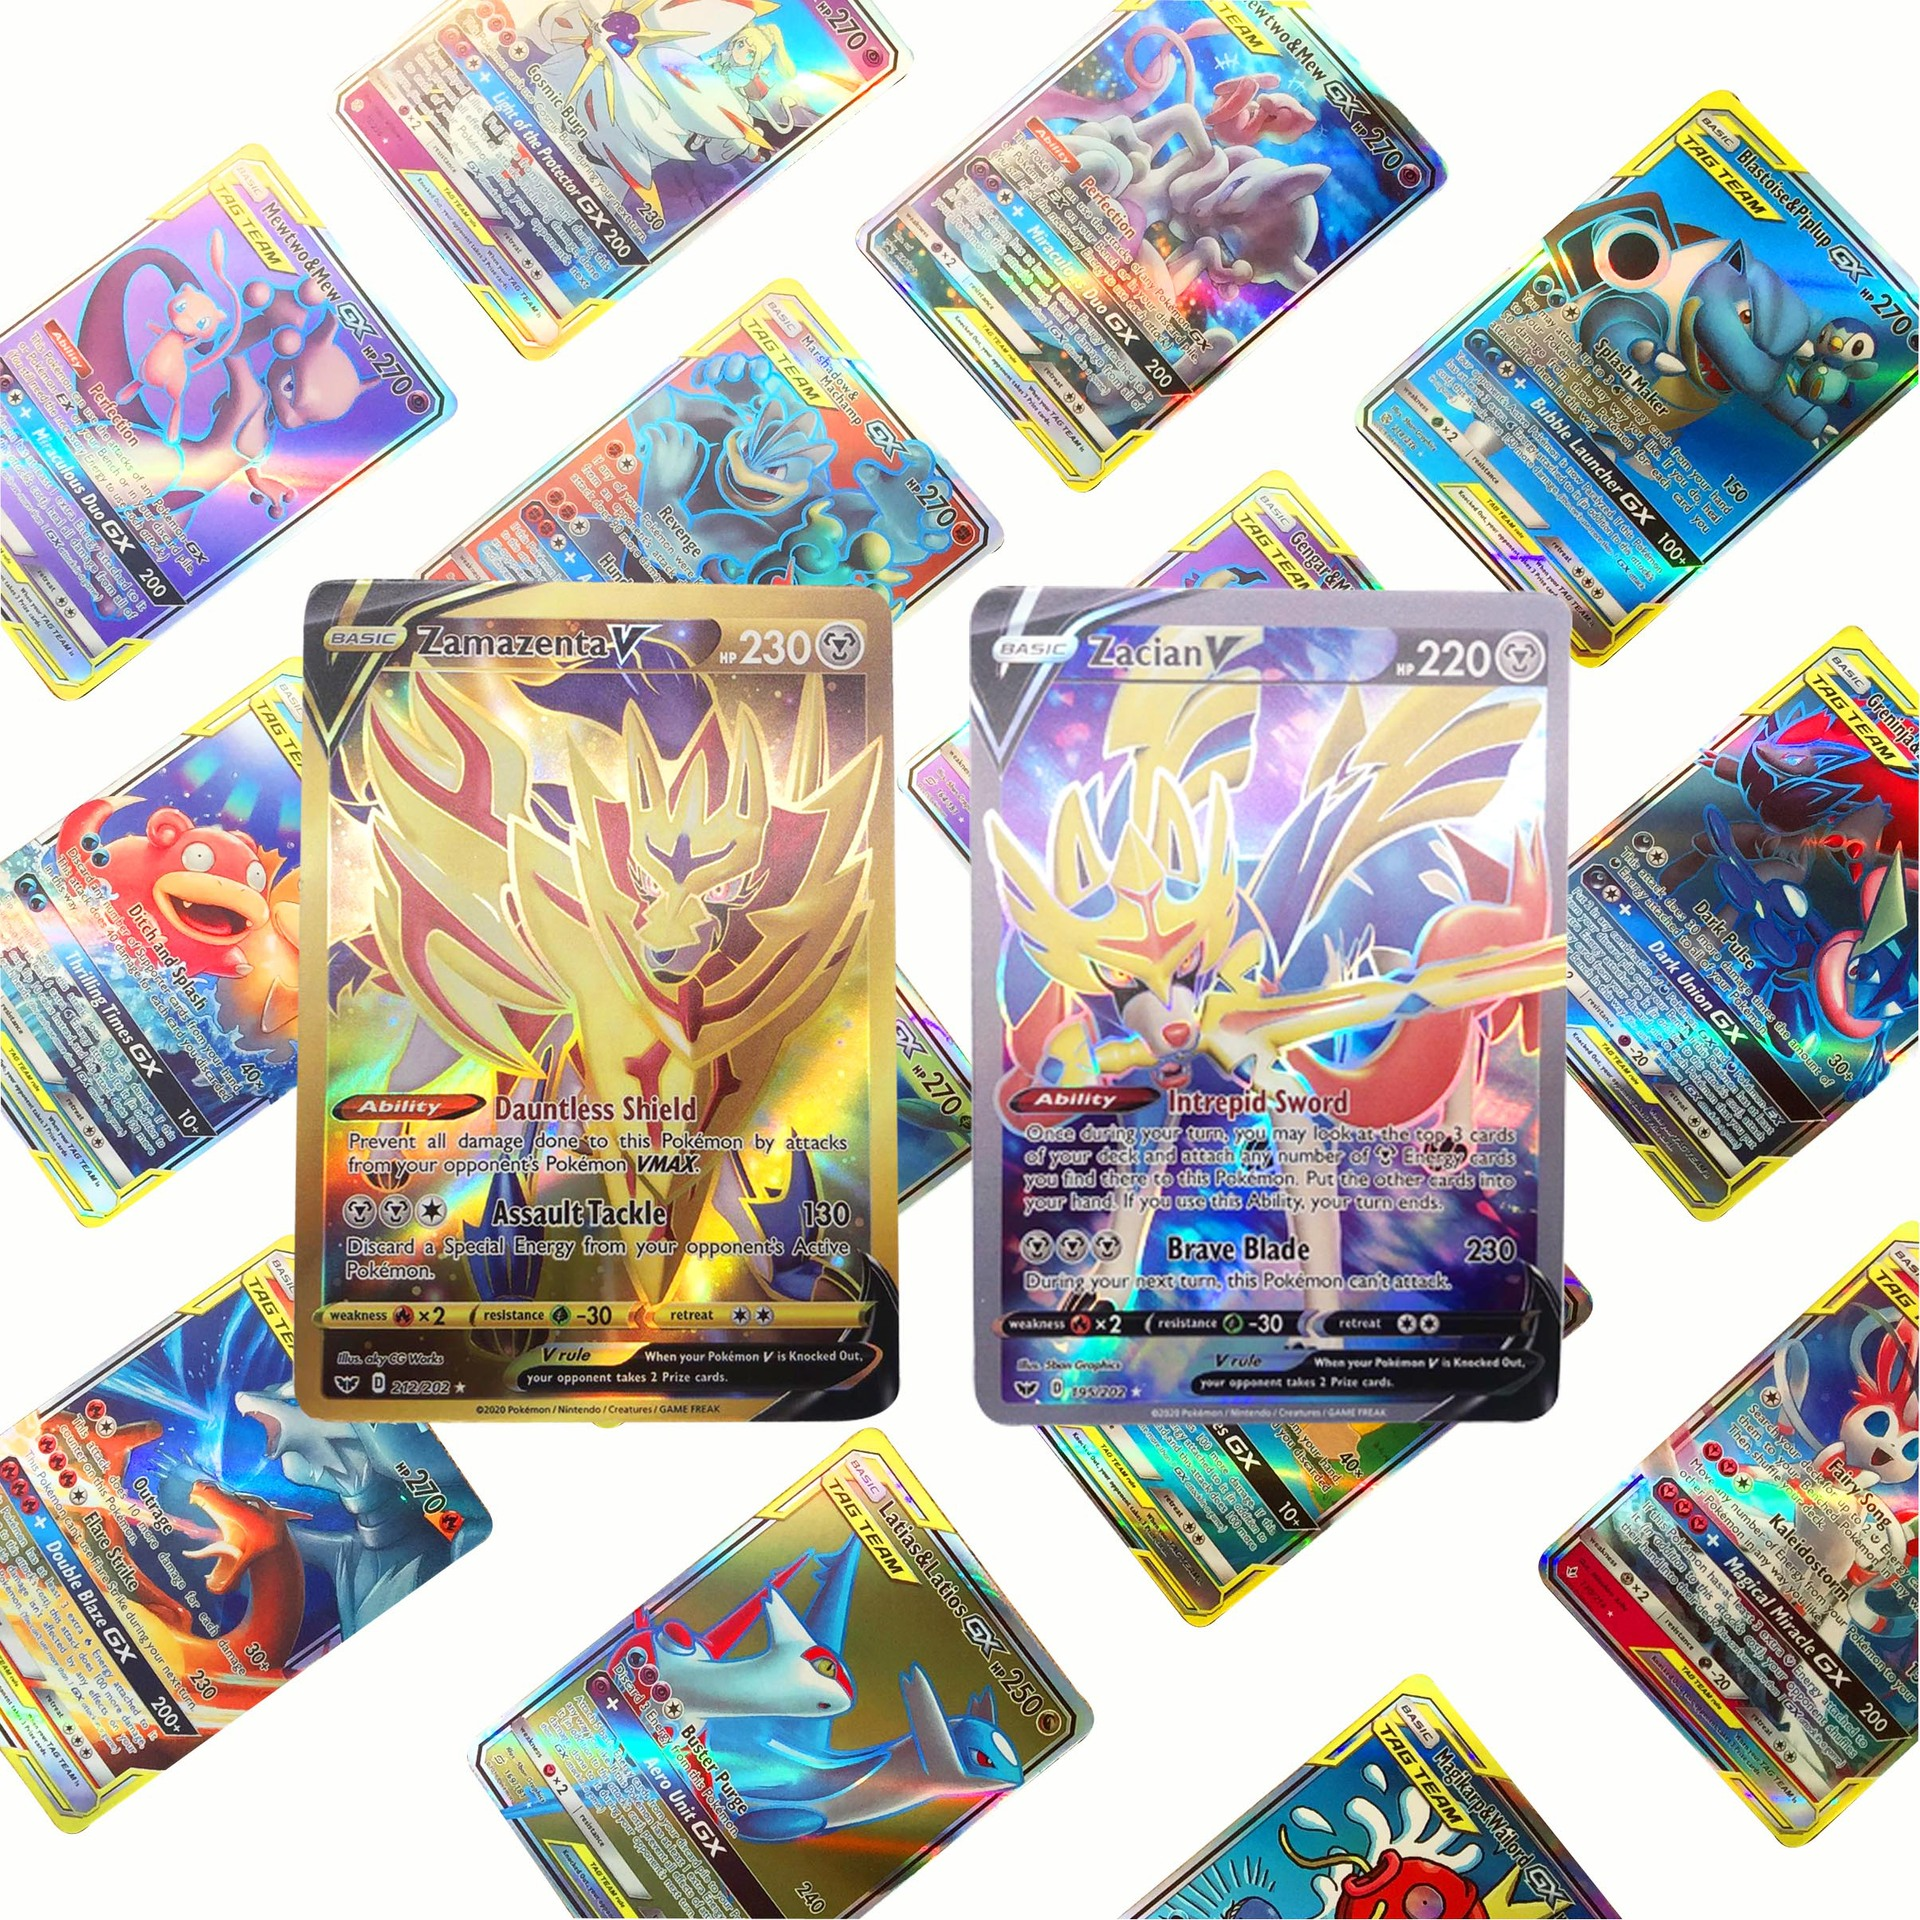 2020-new-font-b-pokemon-b-font-battle-game-card-vmax-card-cards-card-gx-mega-ex-english-version-kind-kids-toy-gift